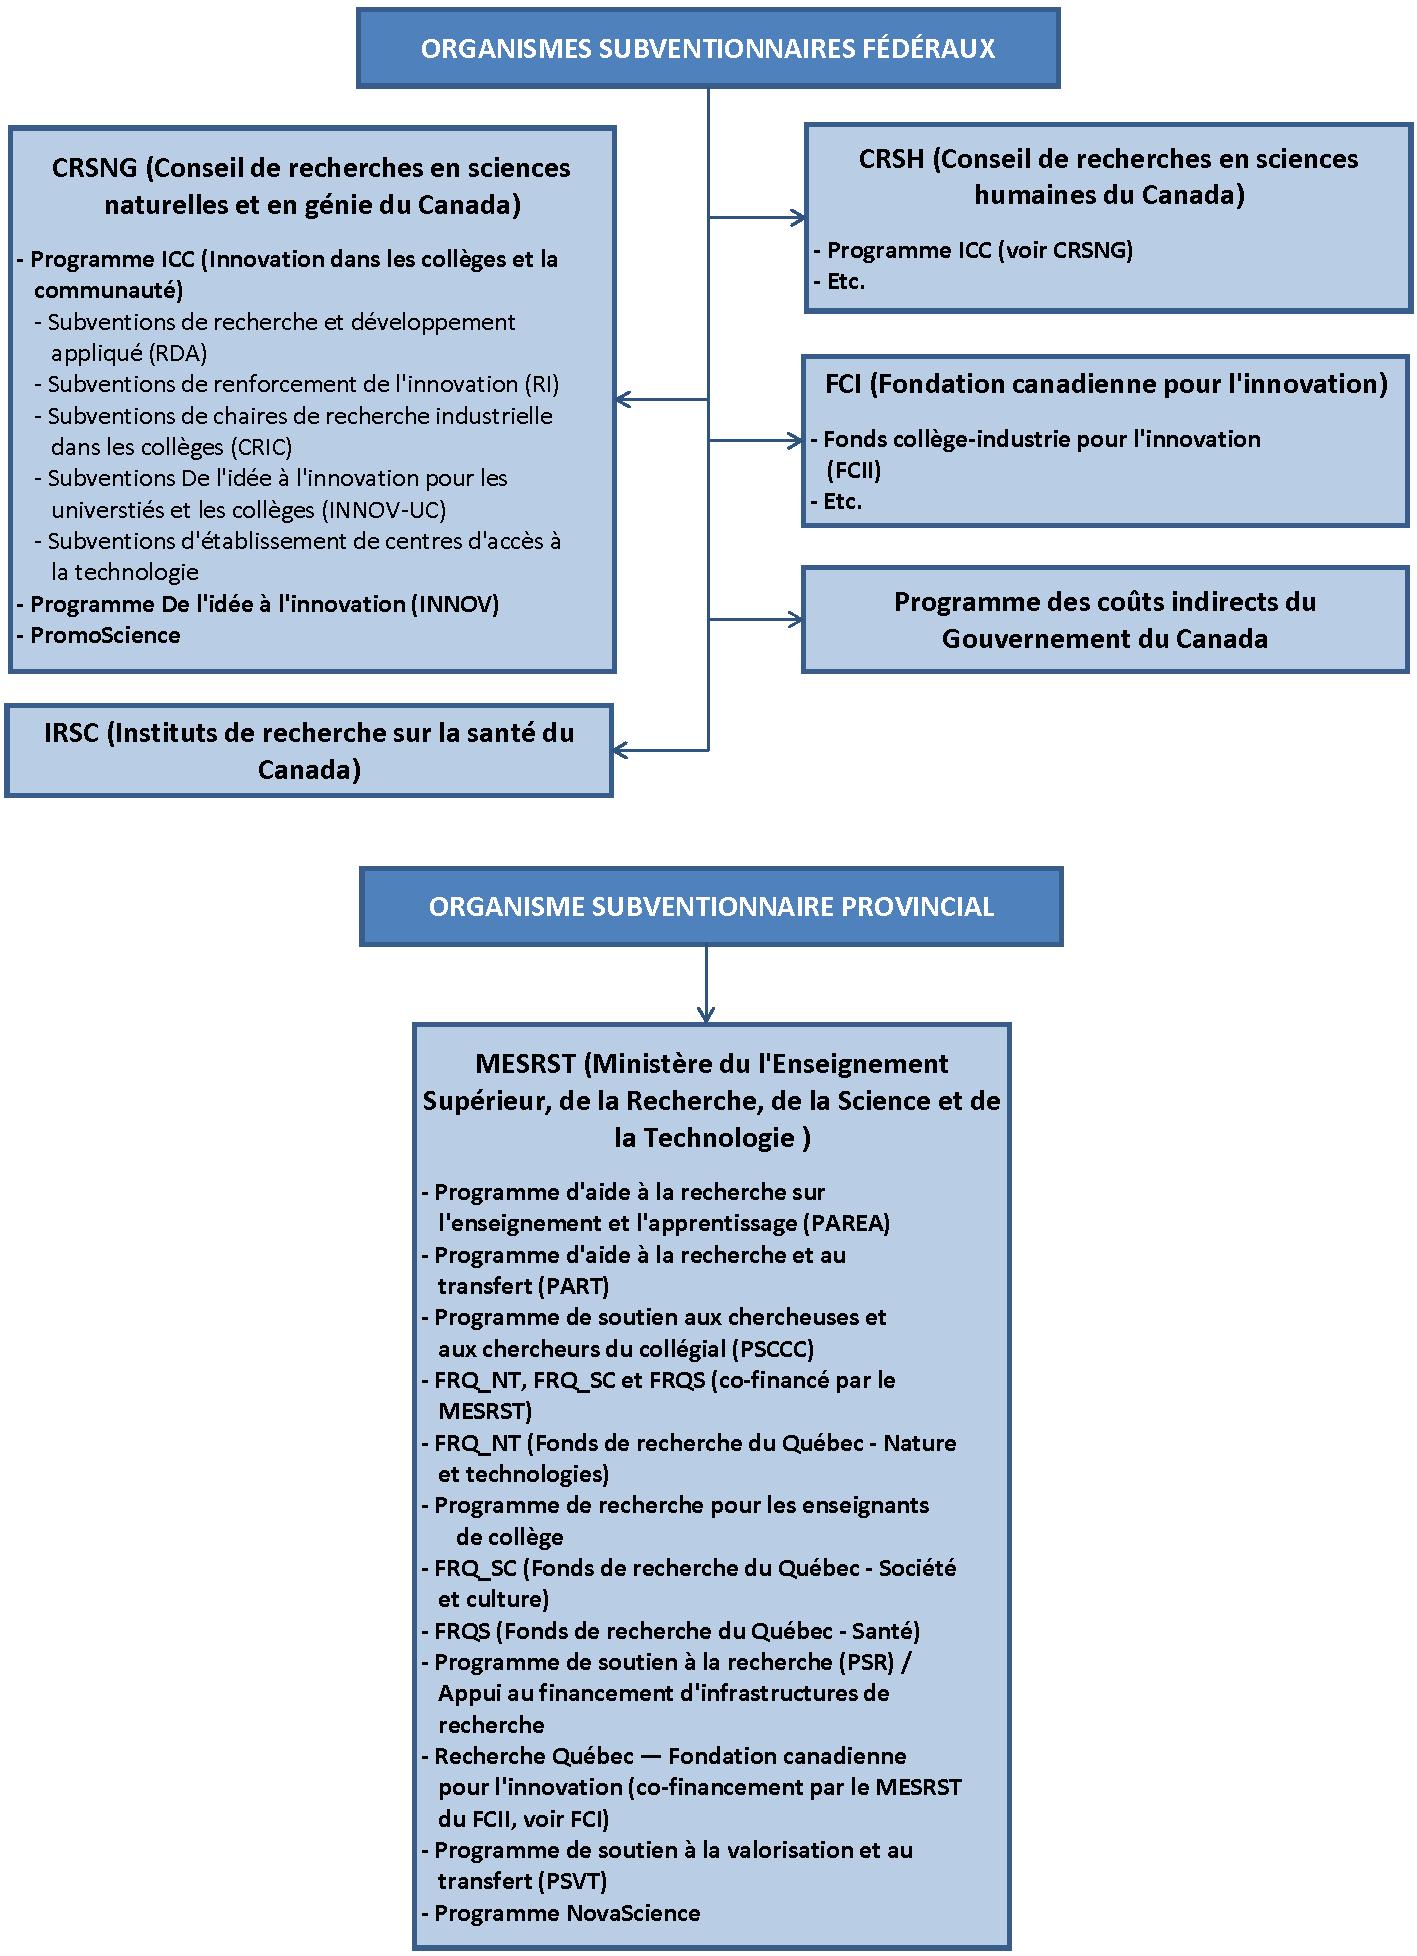 organigramme-organismes-subventionnaires